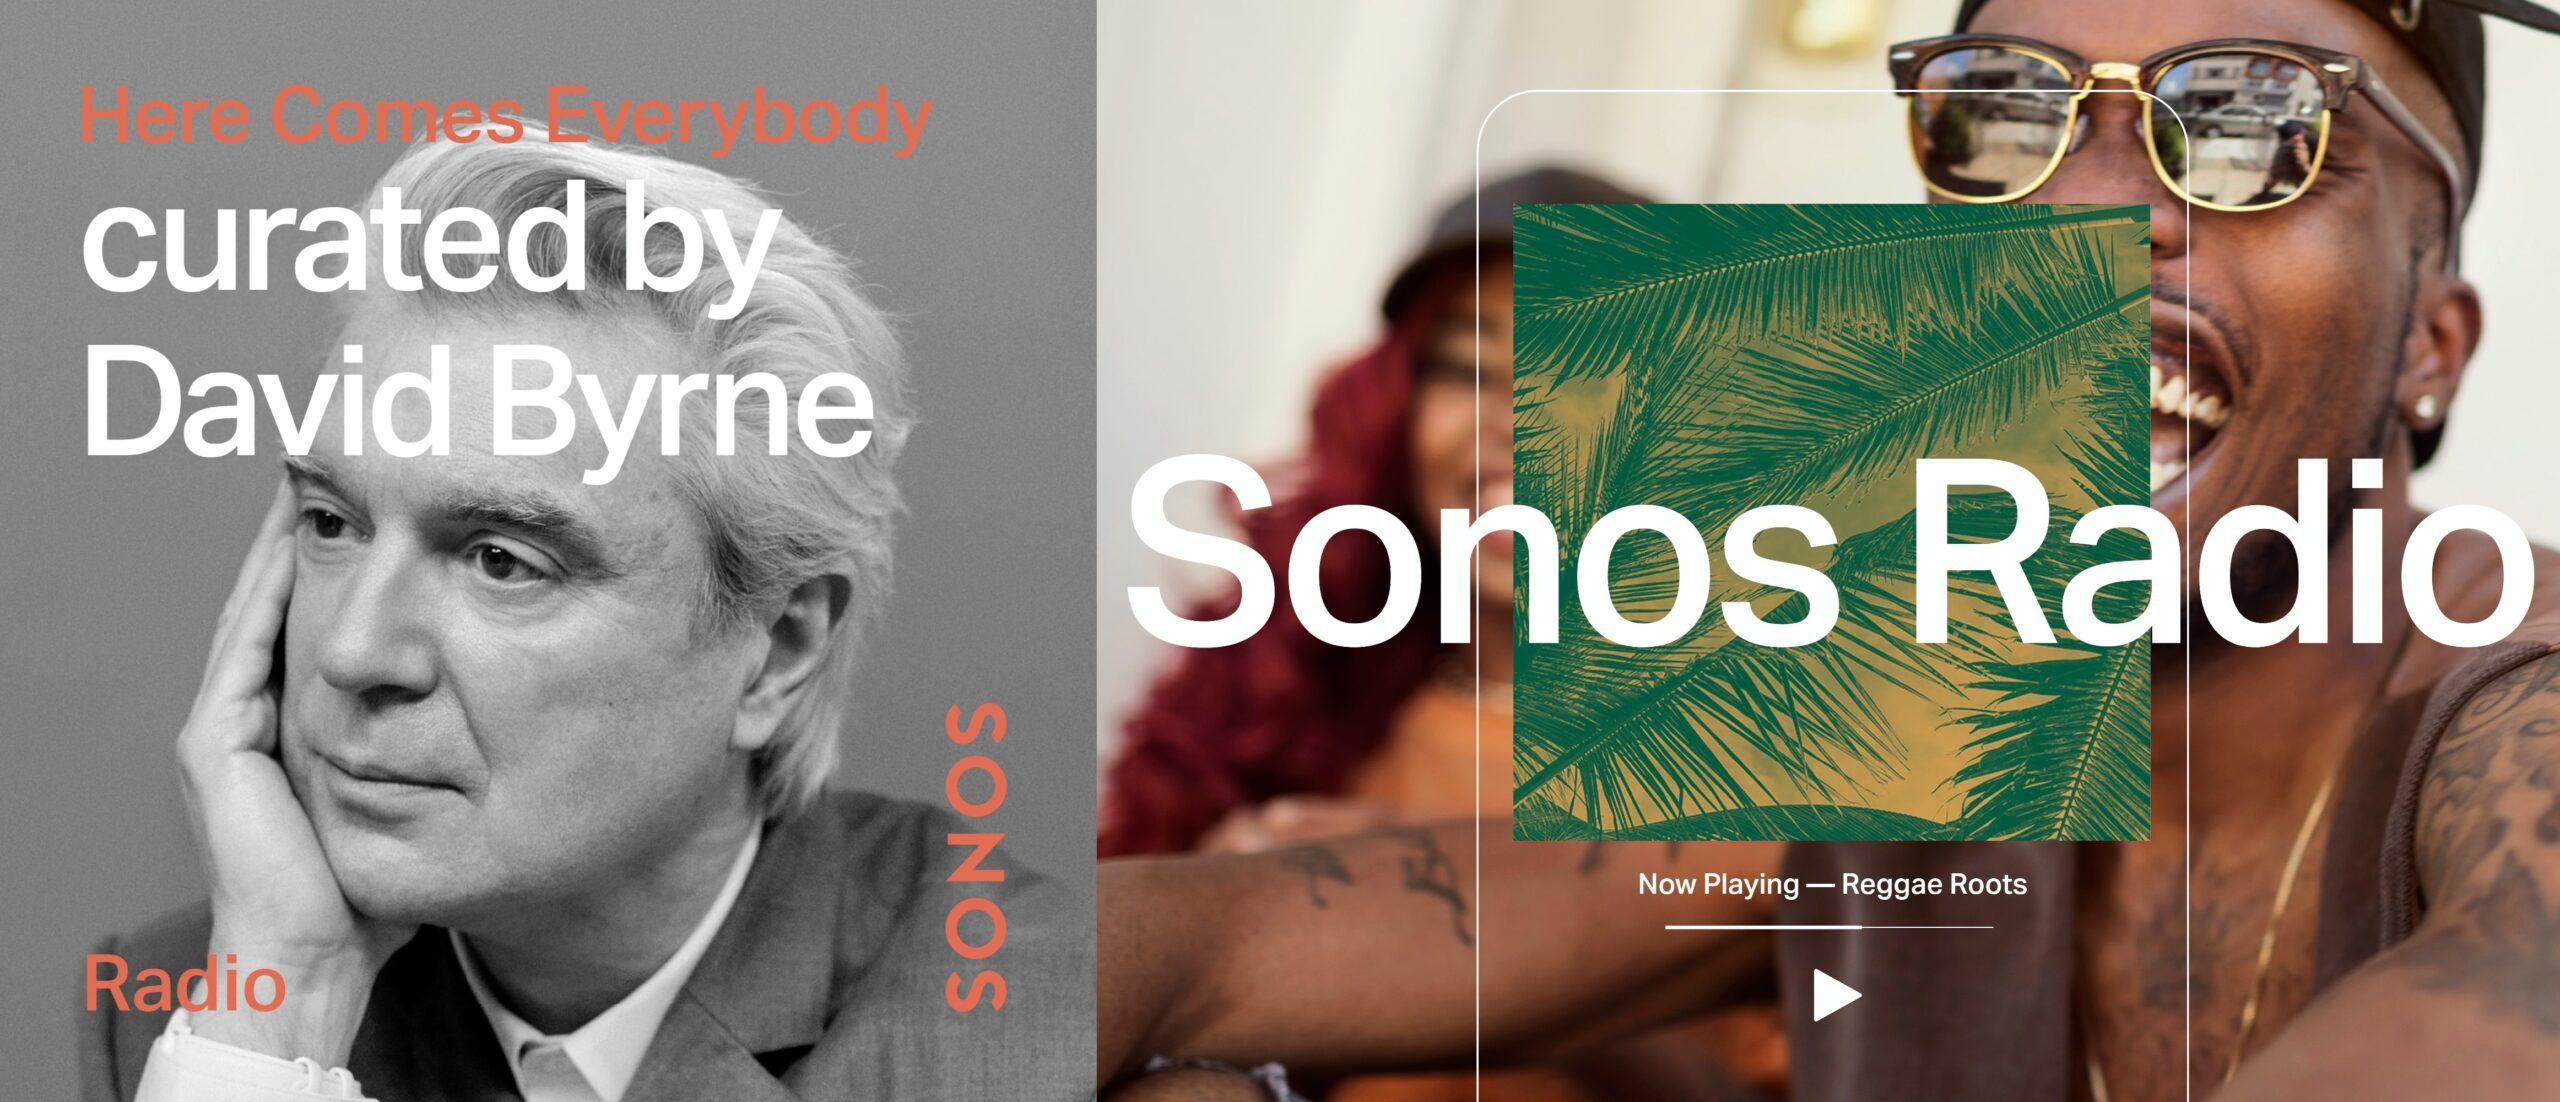 Sonos Radio with Reggae and David Byrne